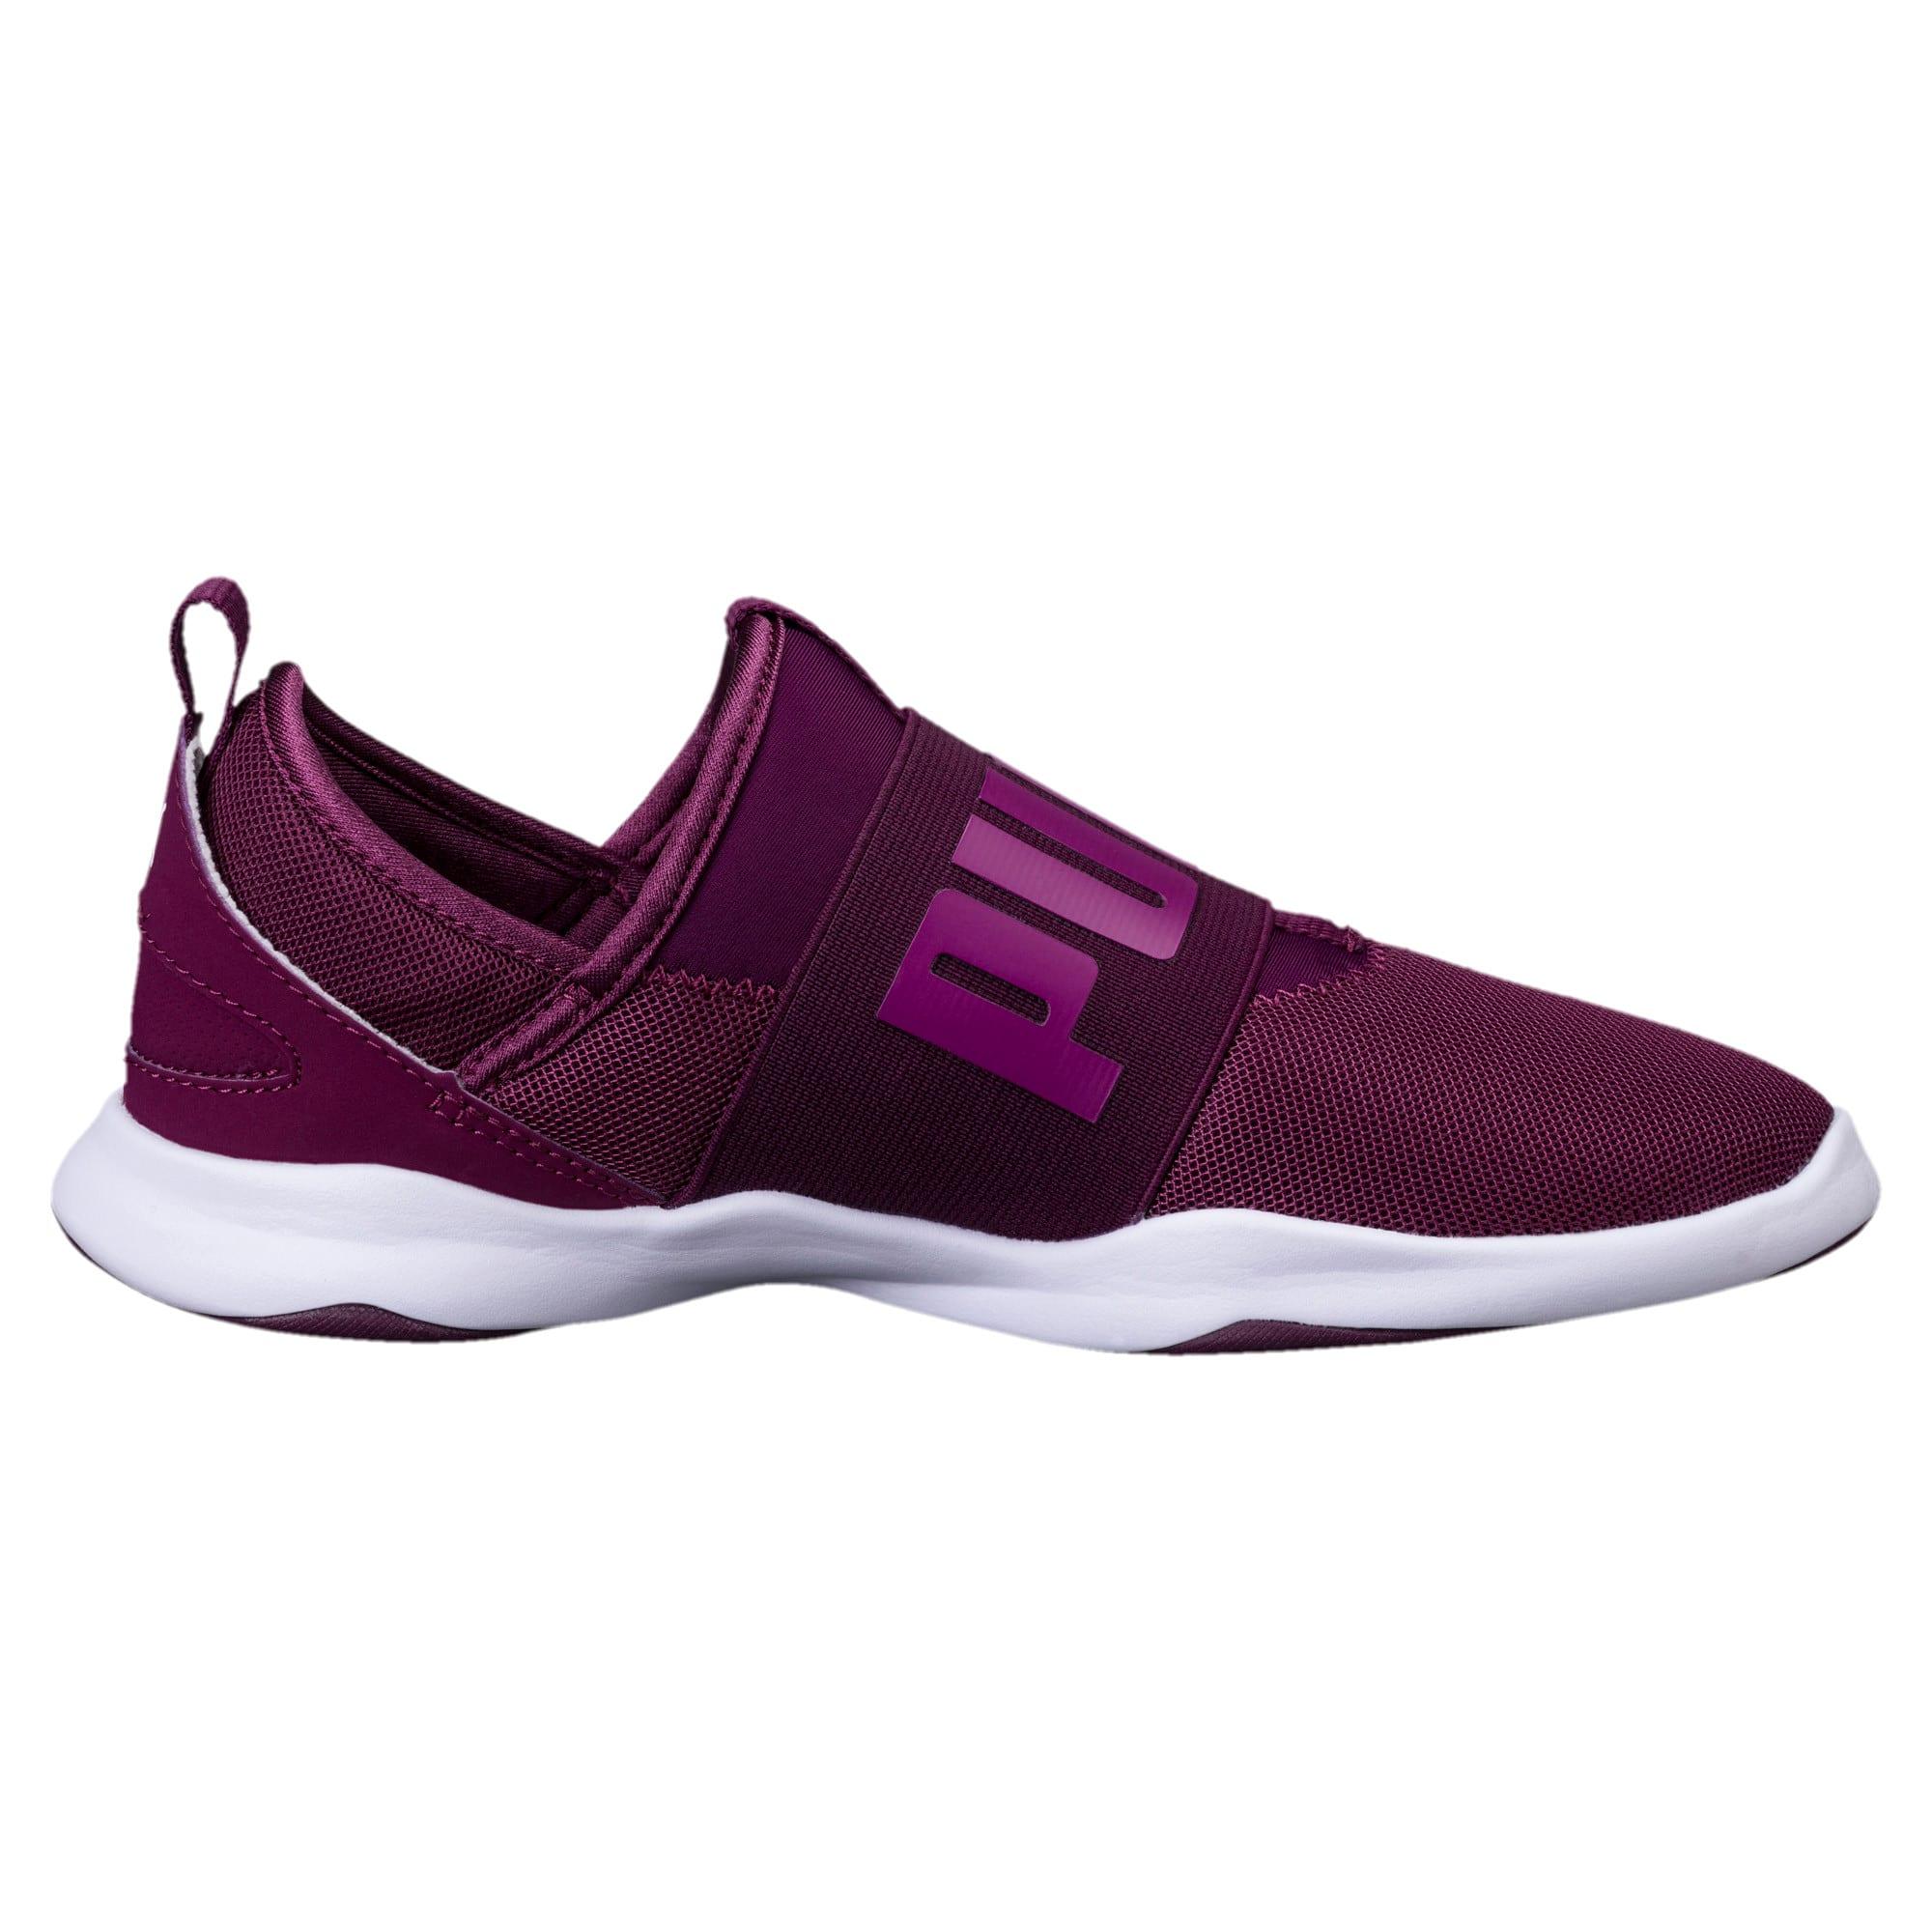 Thumbnail 3 of Dare Unisex Training Shoes, Dark Purple-Dark Purple, medium